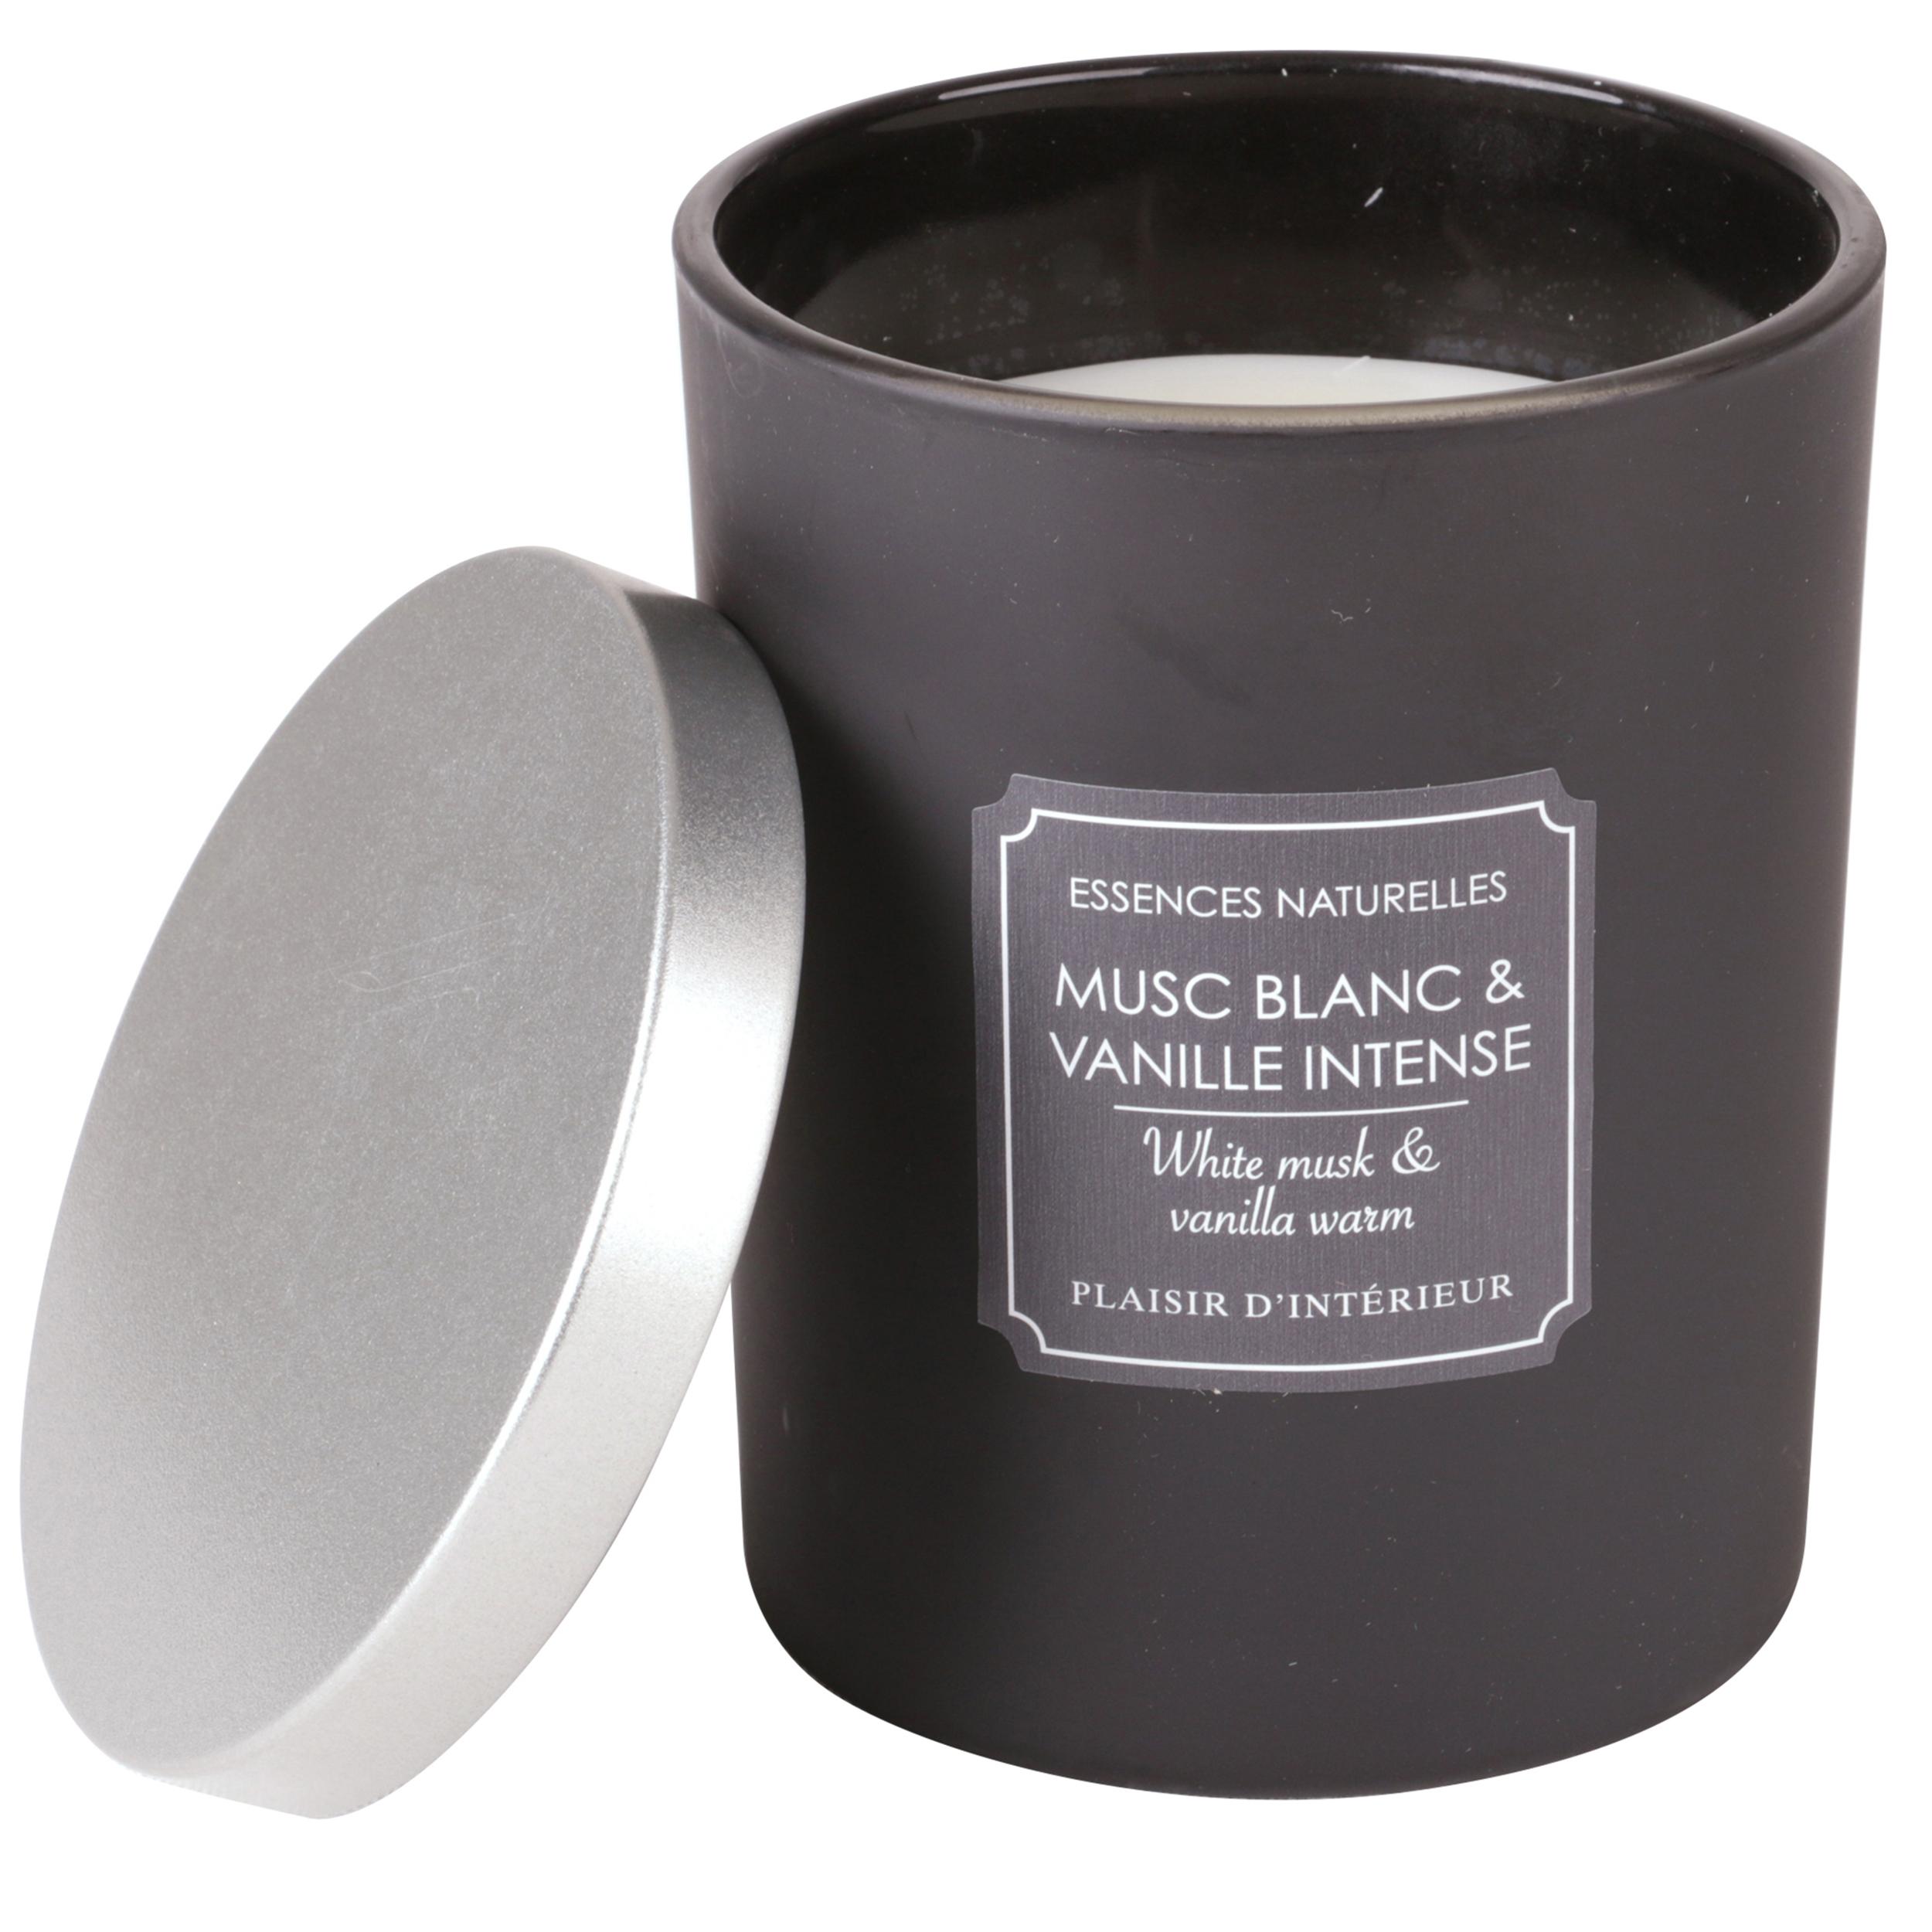 BOUGIE PARFUMEE MUSC BLANC & VANILLE INTENSE (L)